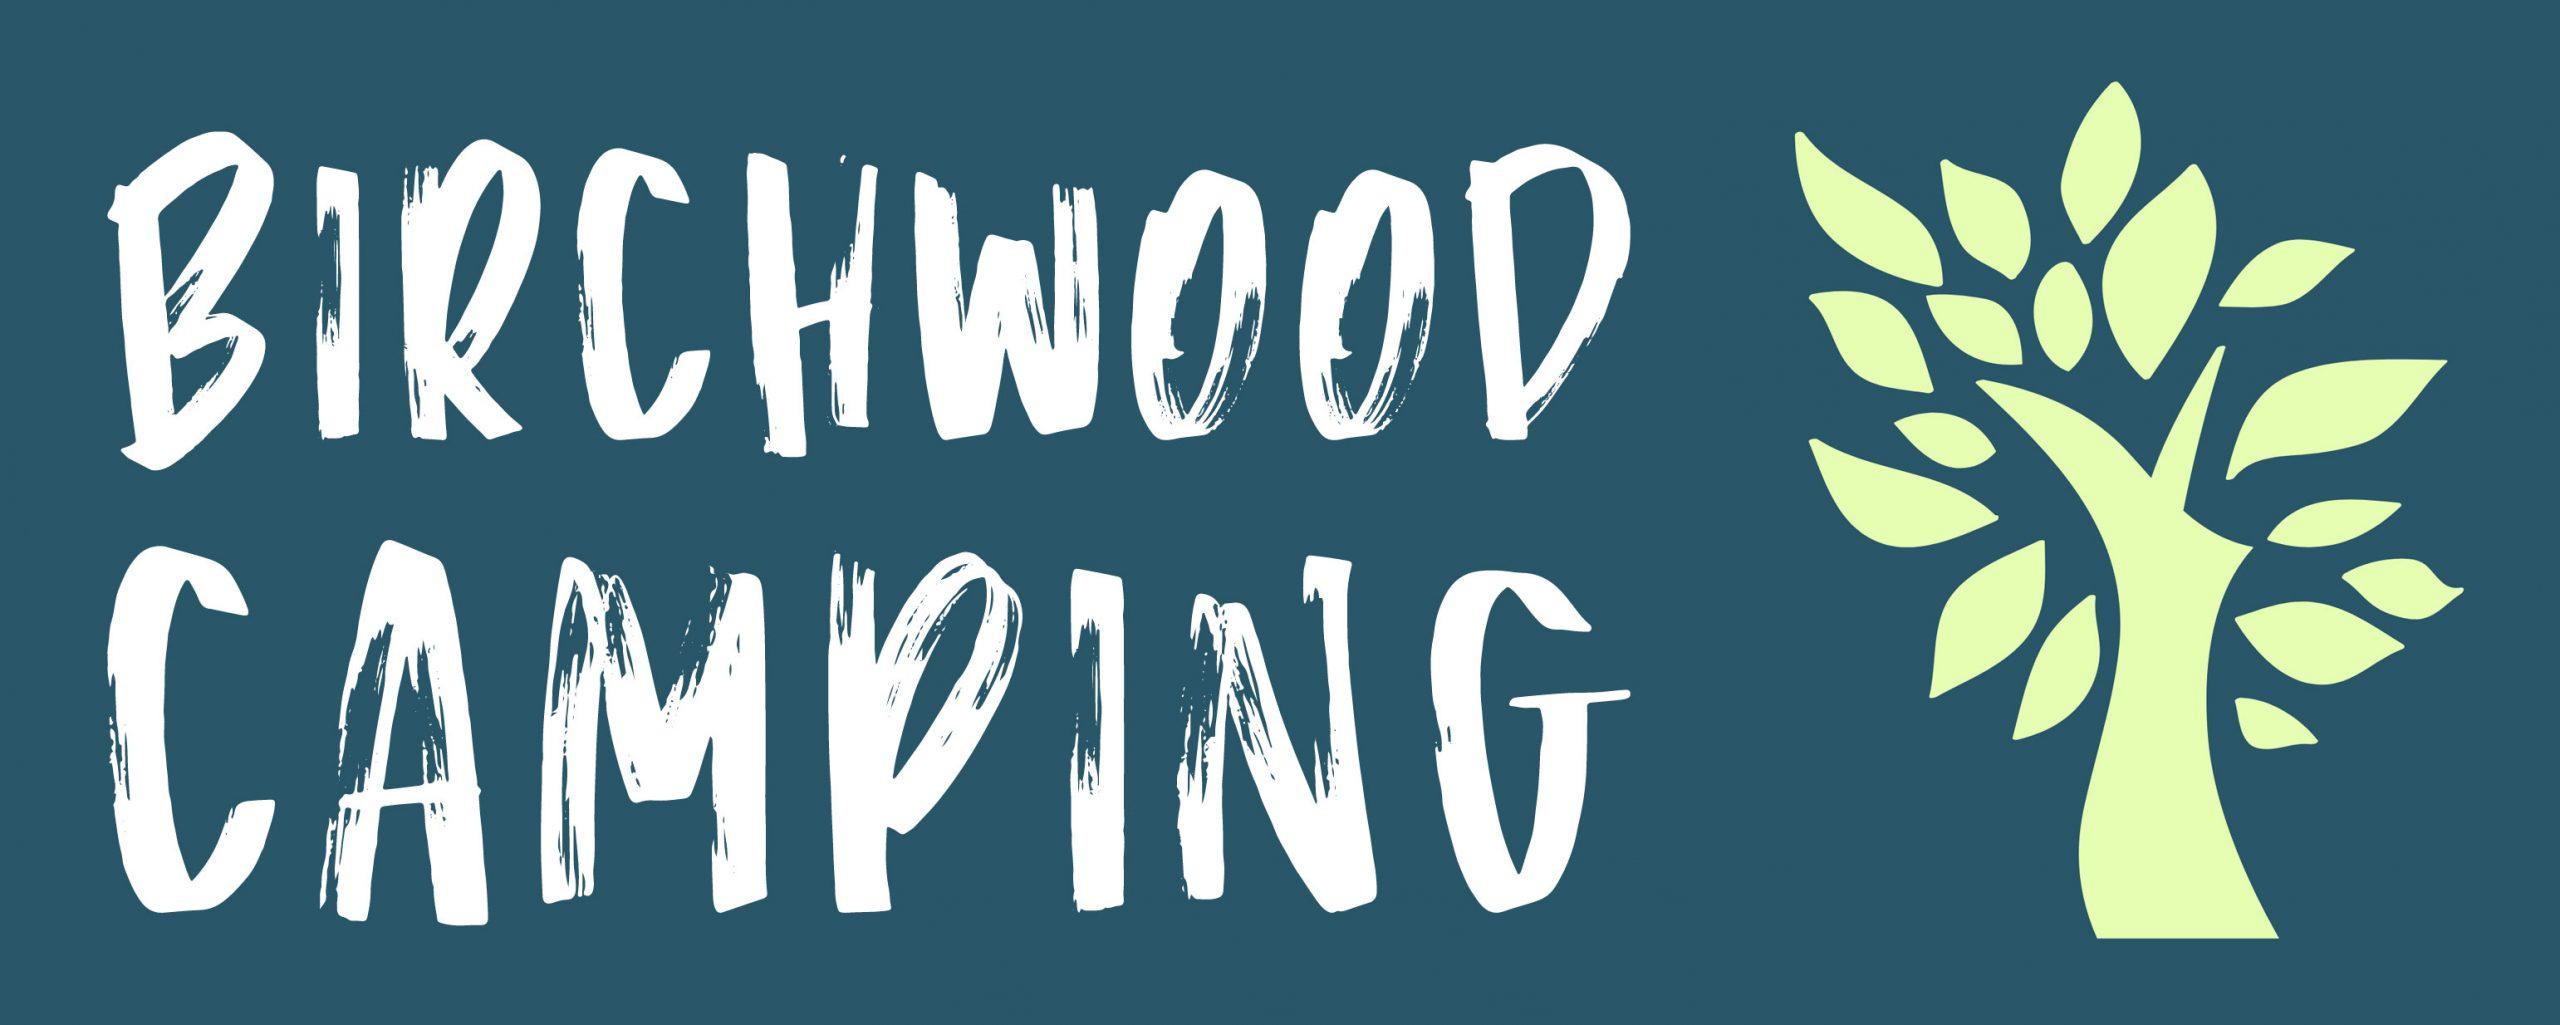 Birchwood Camping